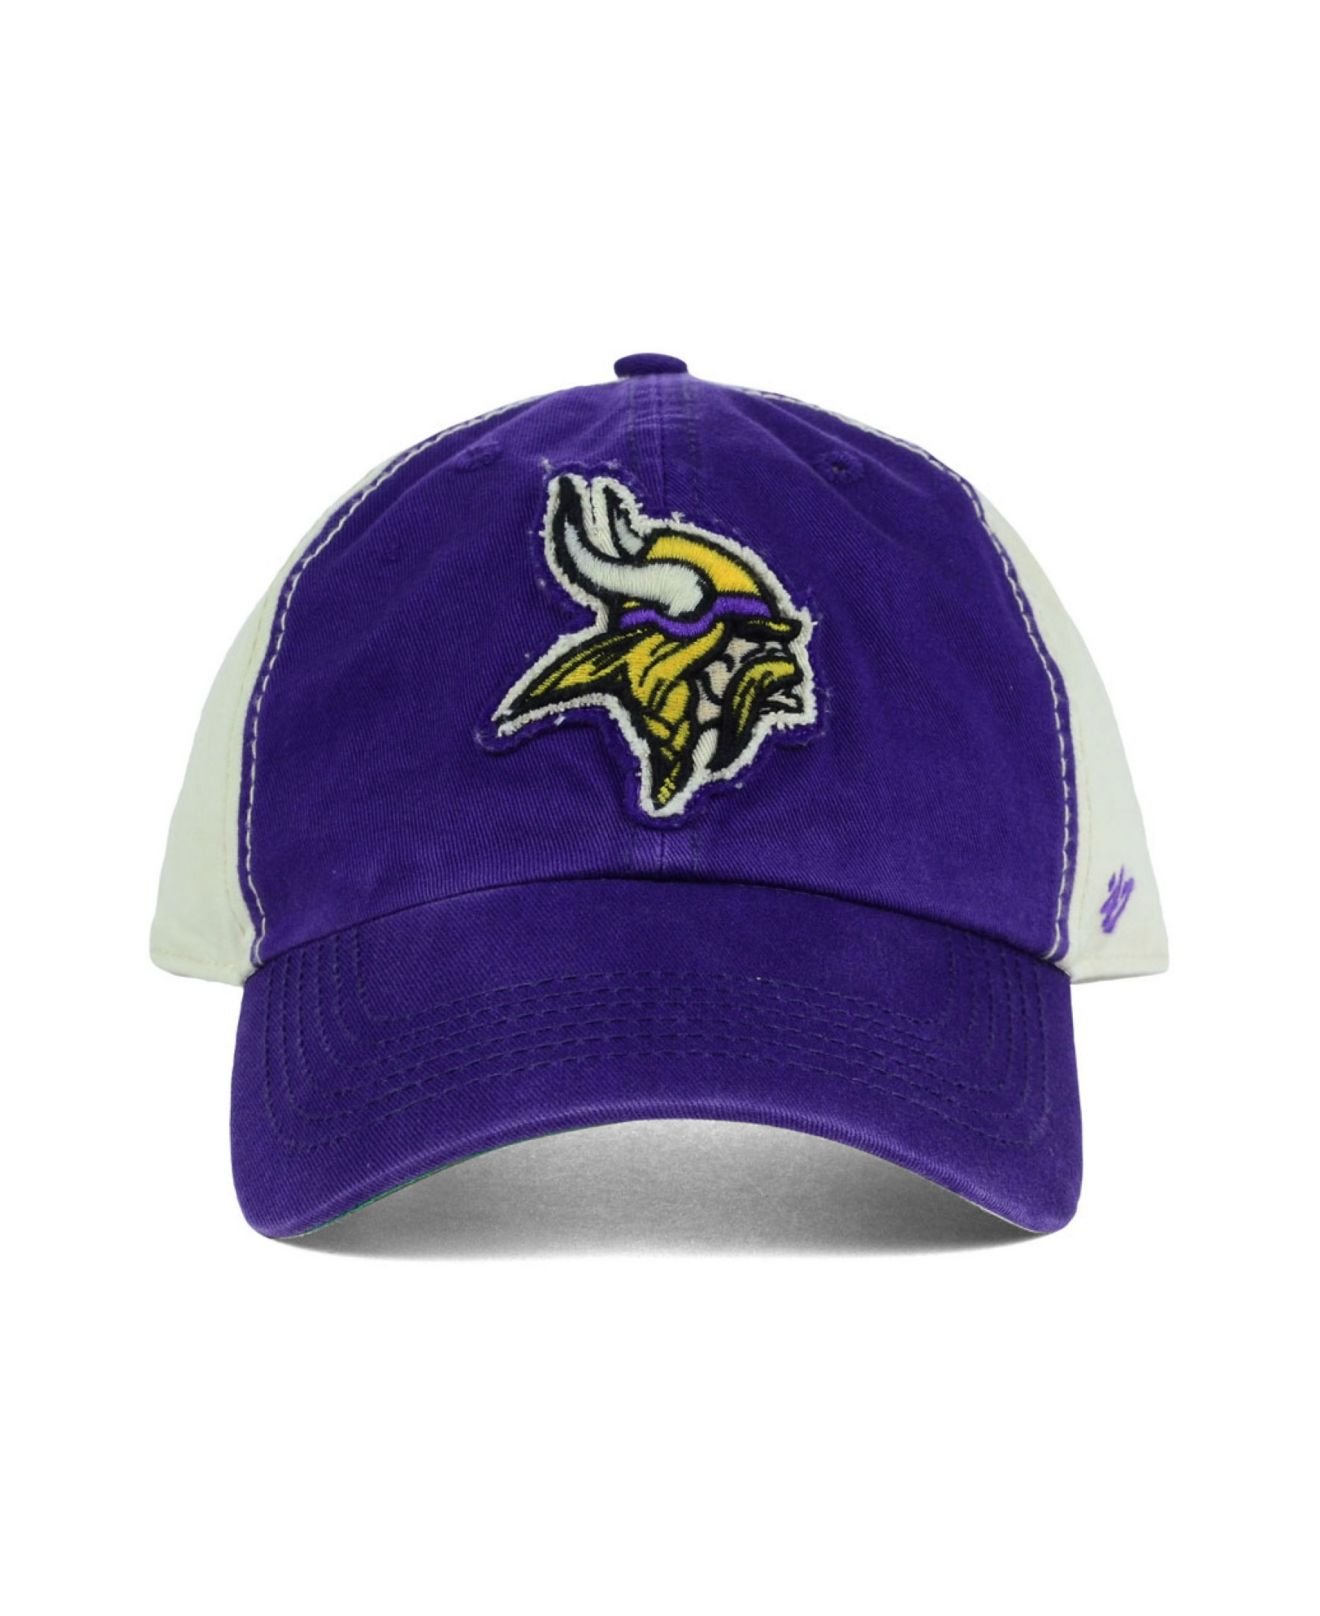 0fec2fc7 Lyst - 47 Brand Minnesota Vikings Nfl Derby Clean Up Cap in Purple ...